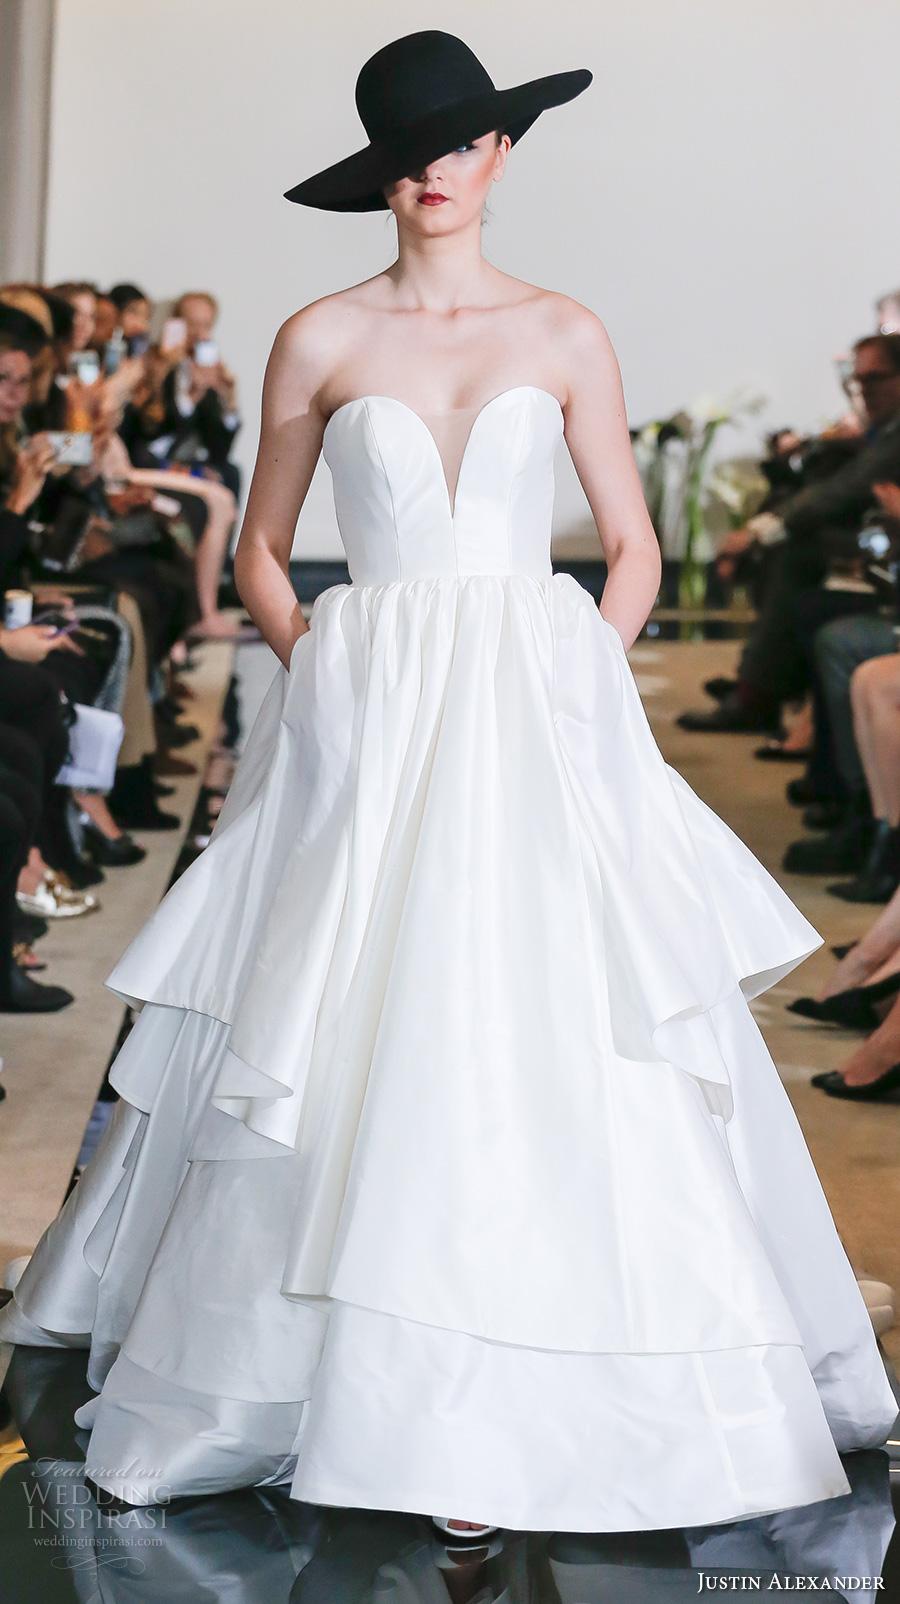 Justin Alexander Spring 2018 Wedding Dresses  New York